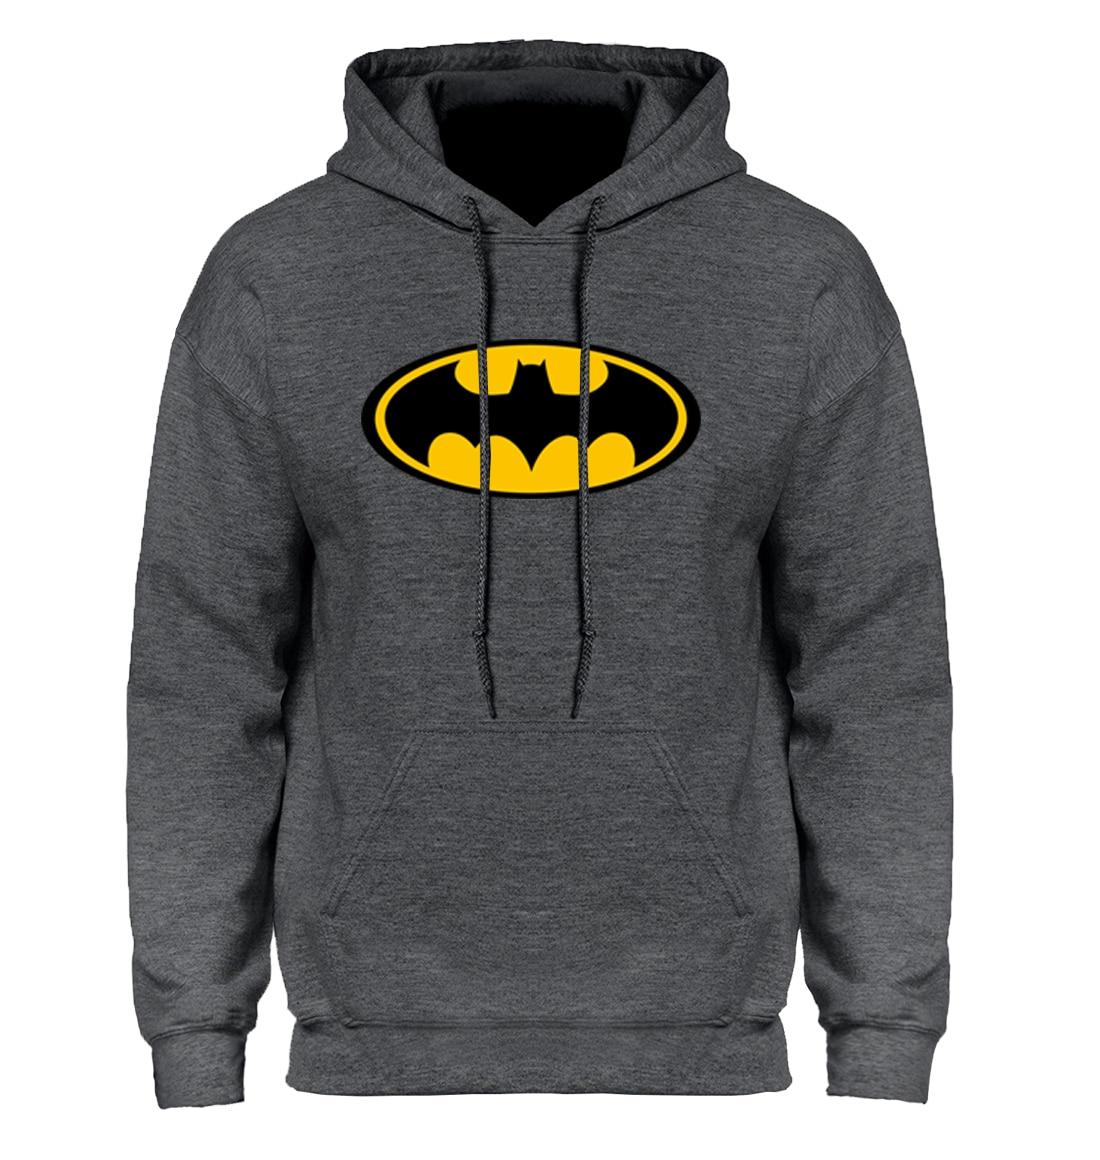 Batman Cartoon Hoodie Hoodies Sweatshirt Men 2018 Winter Autumn Hooded Hoody Homens Casual Silm Design Hot Sale Male Men's Coat